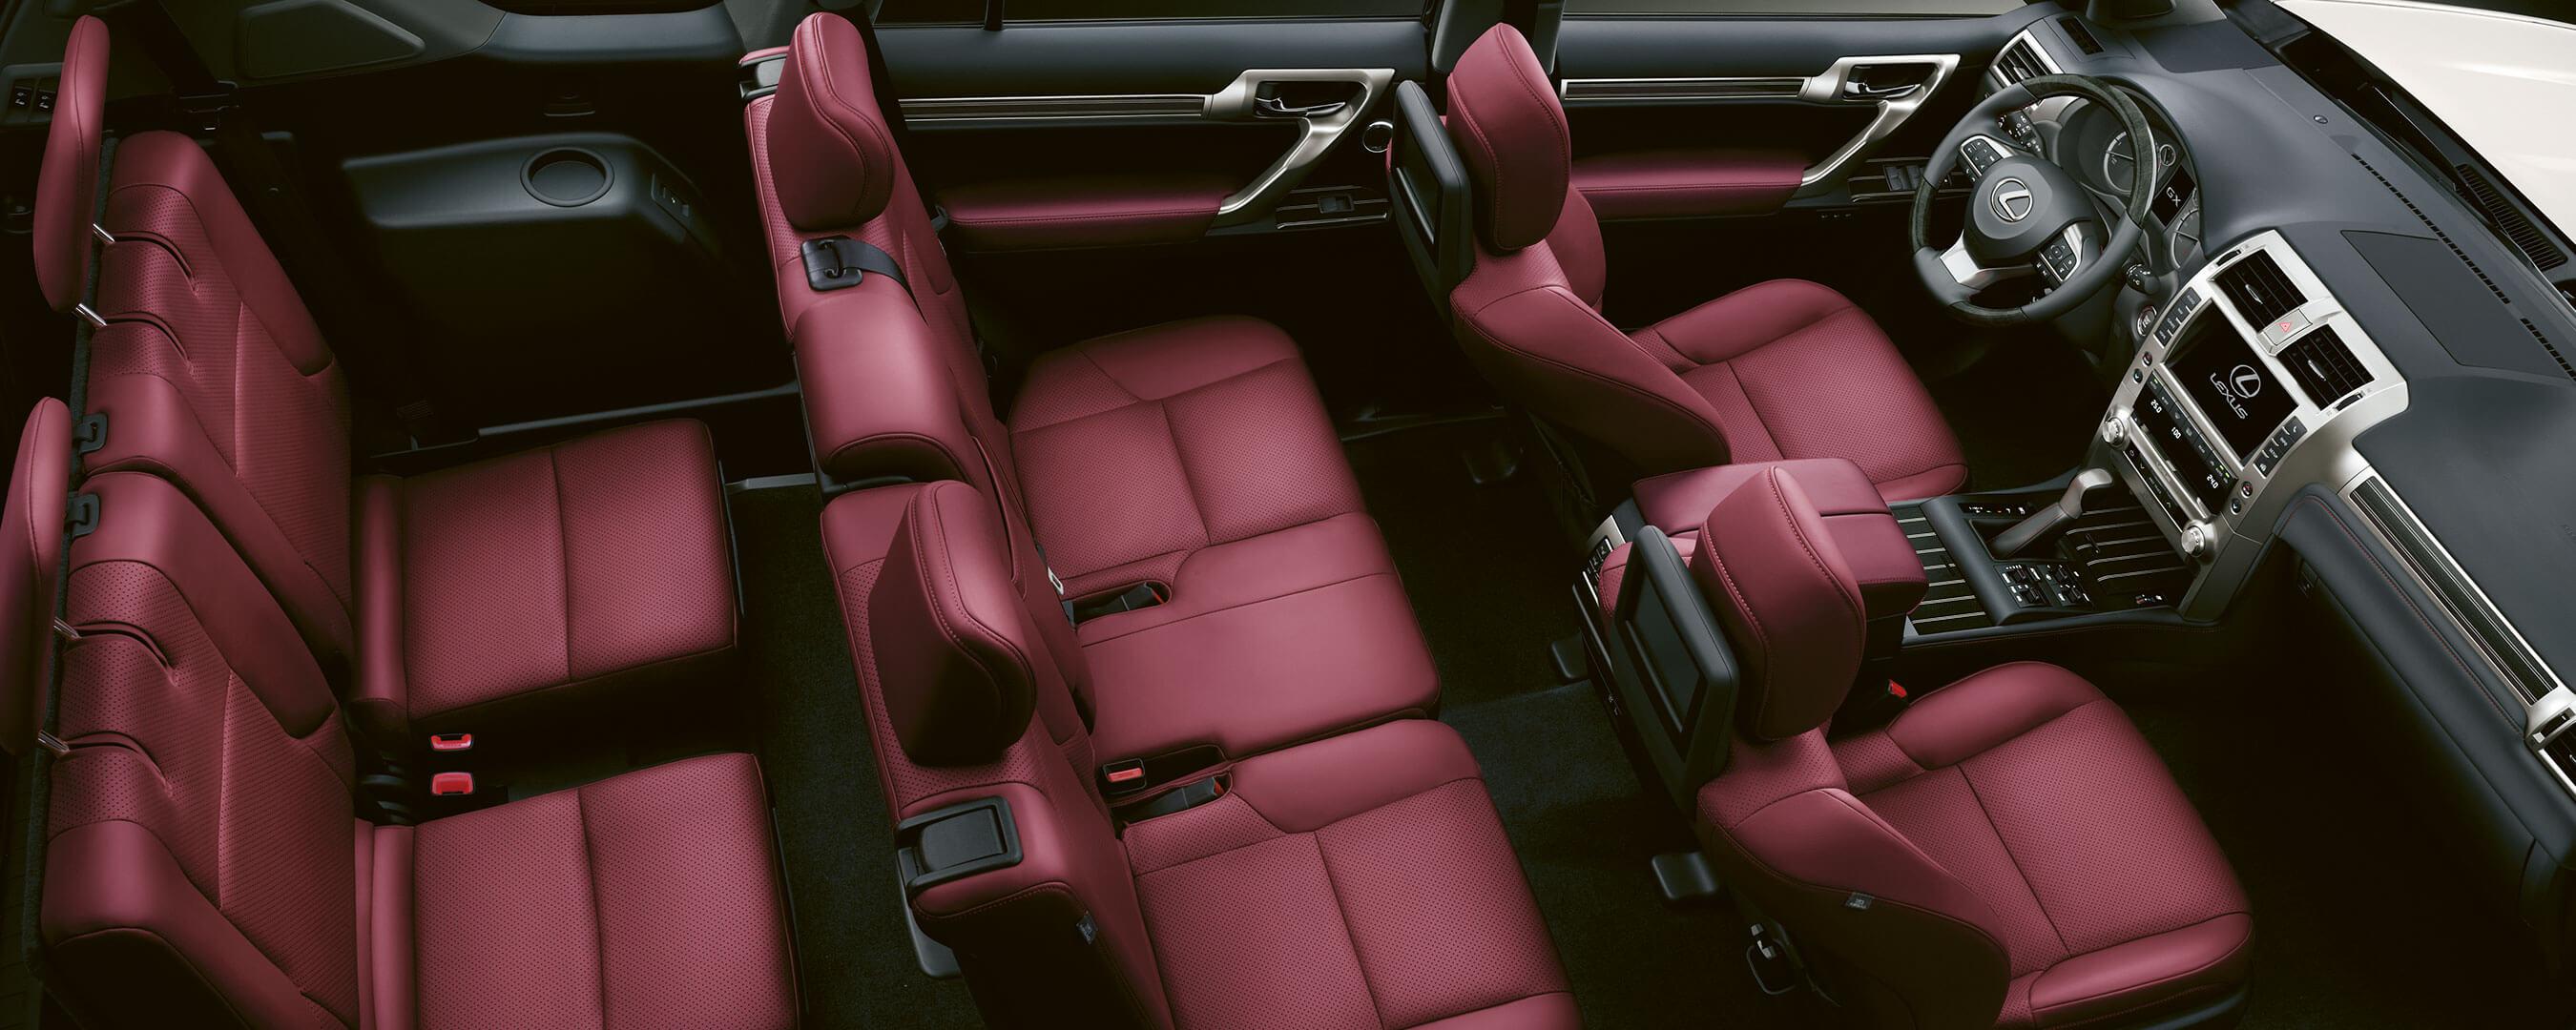 2019 lexus gx experience interior rear